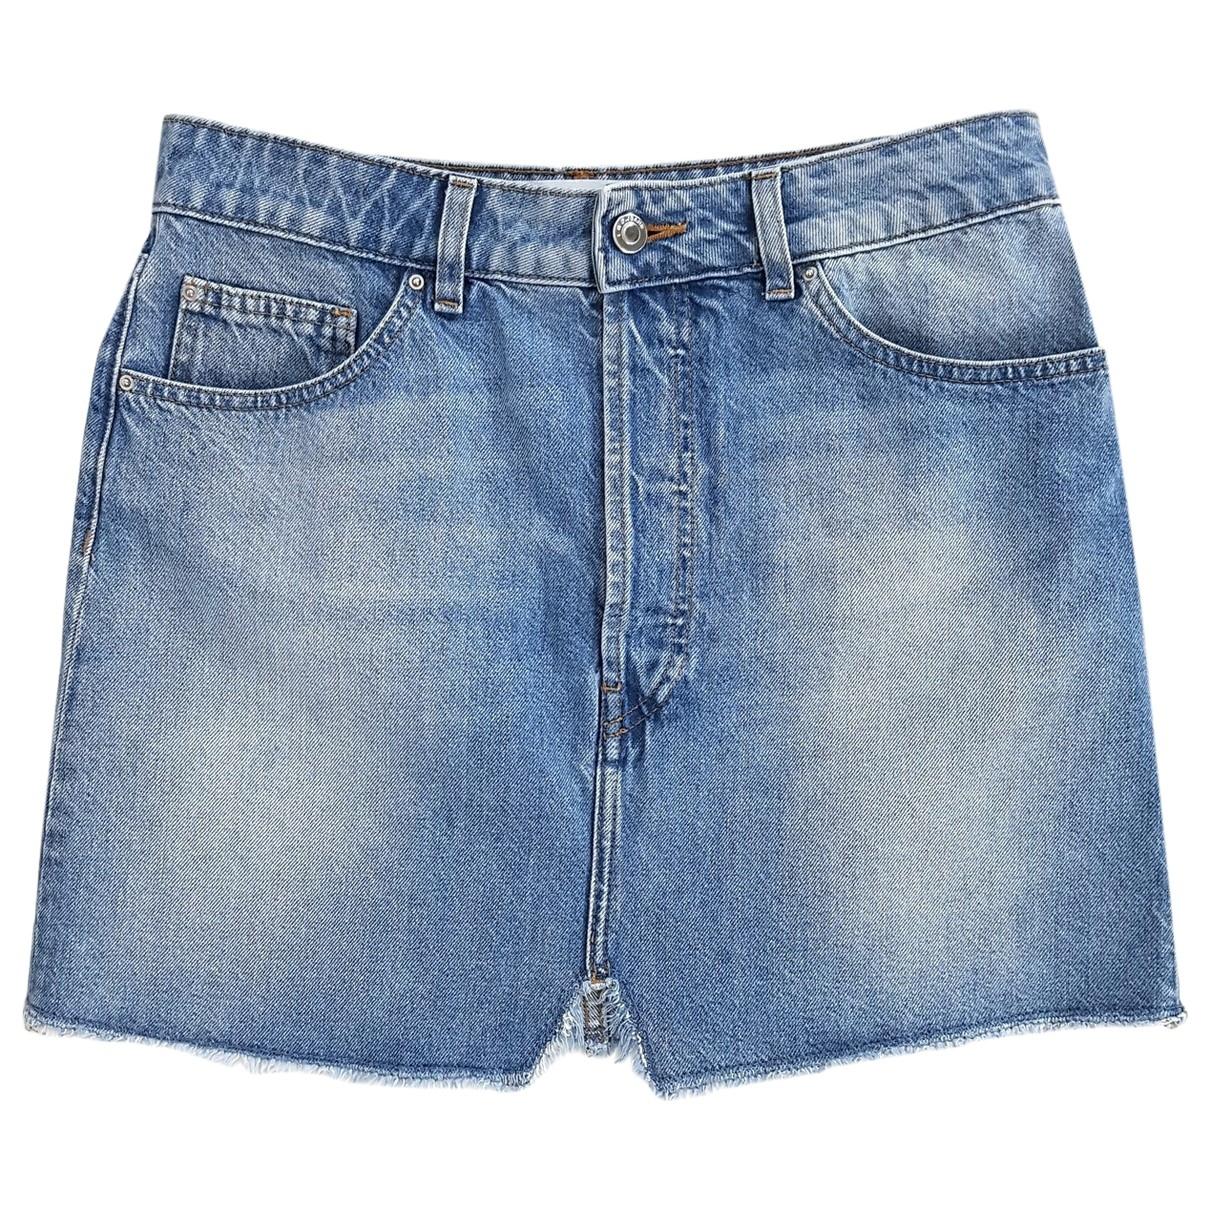 Iro \N Rocke in  Blau Denim - Jeans